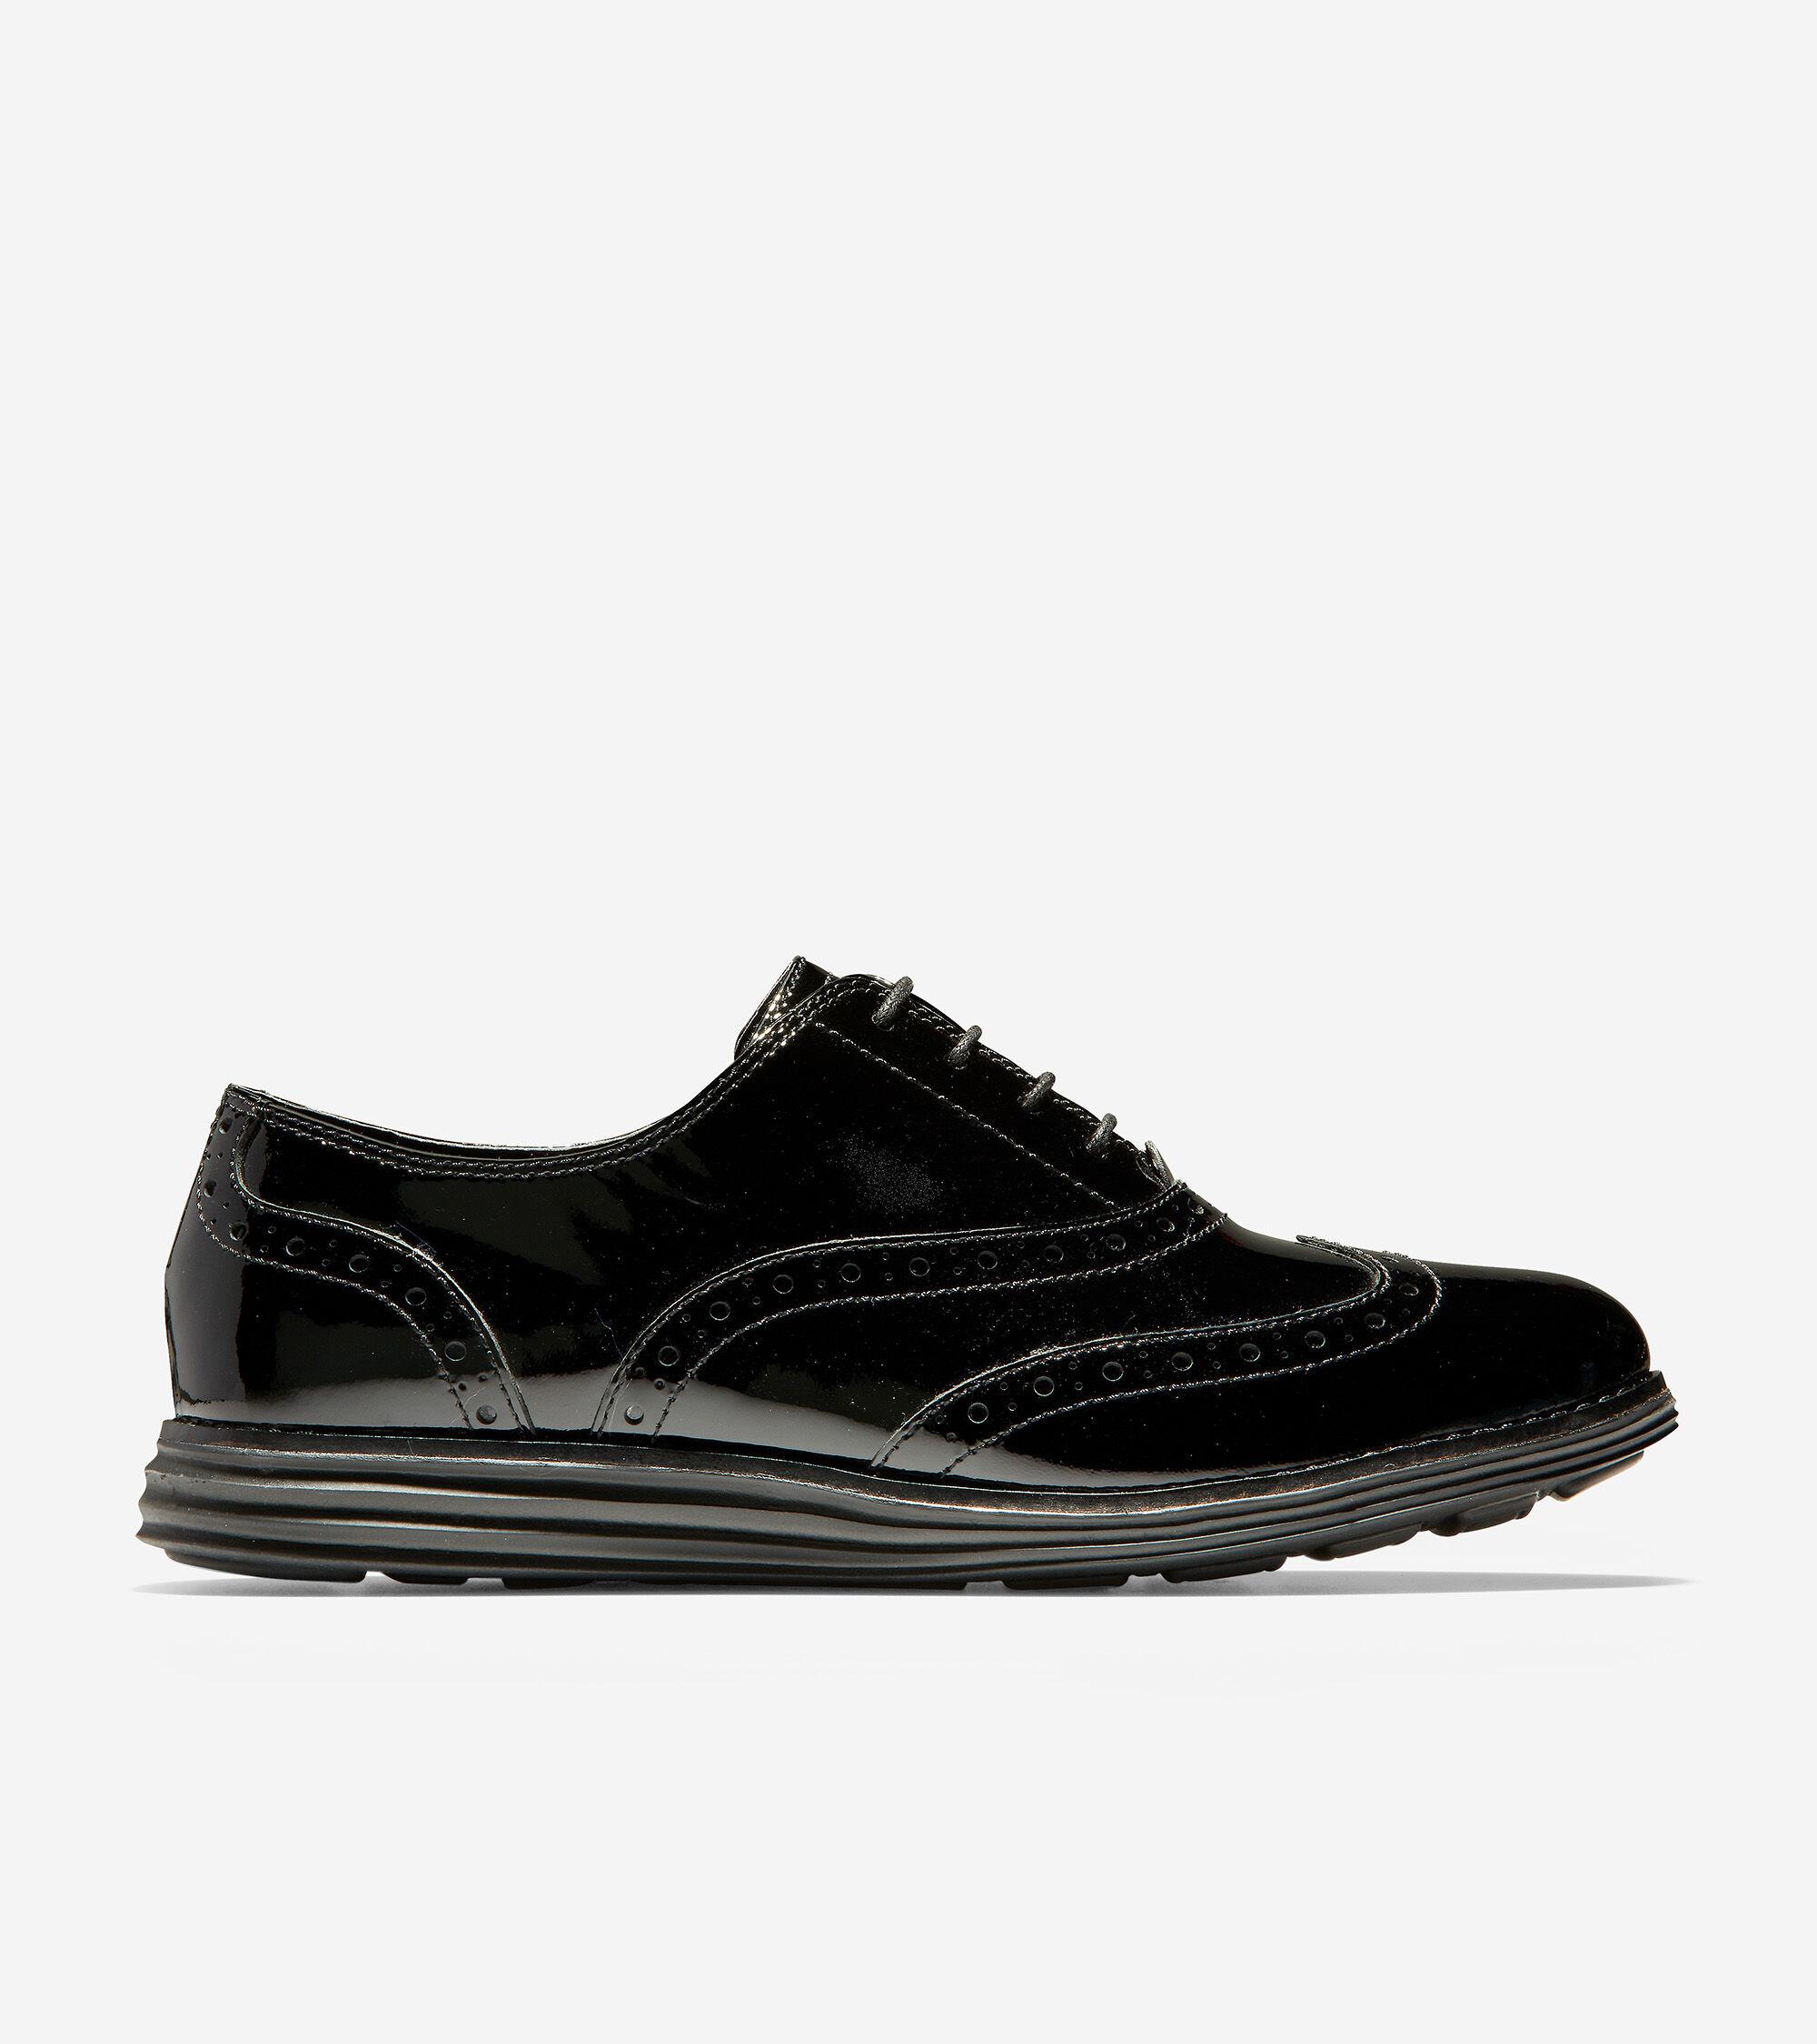 Wingtip Oxford in Black Patent-Black